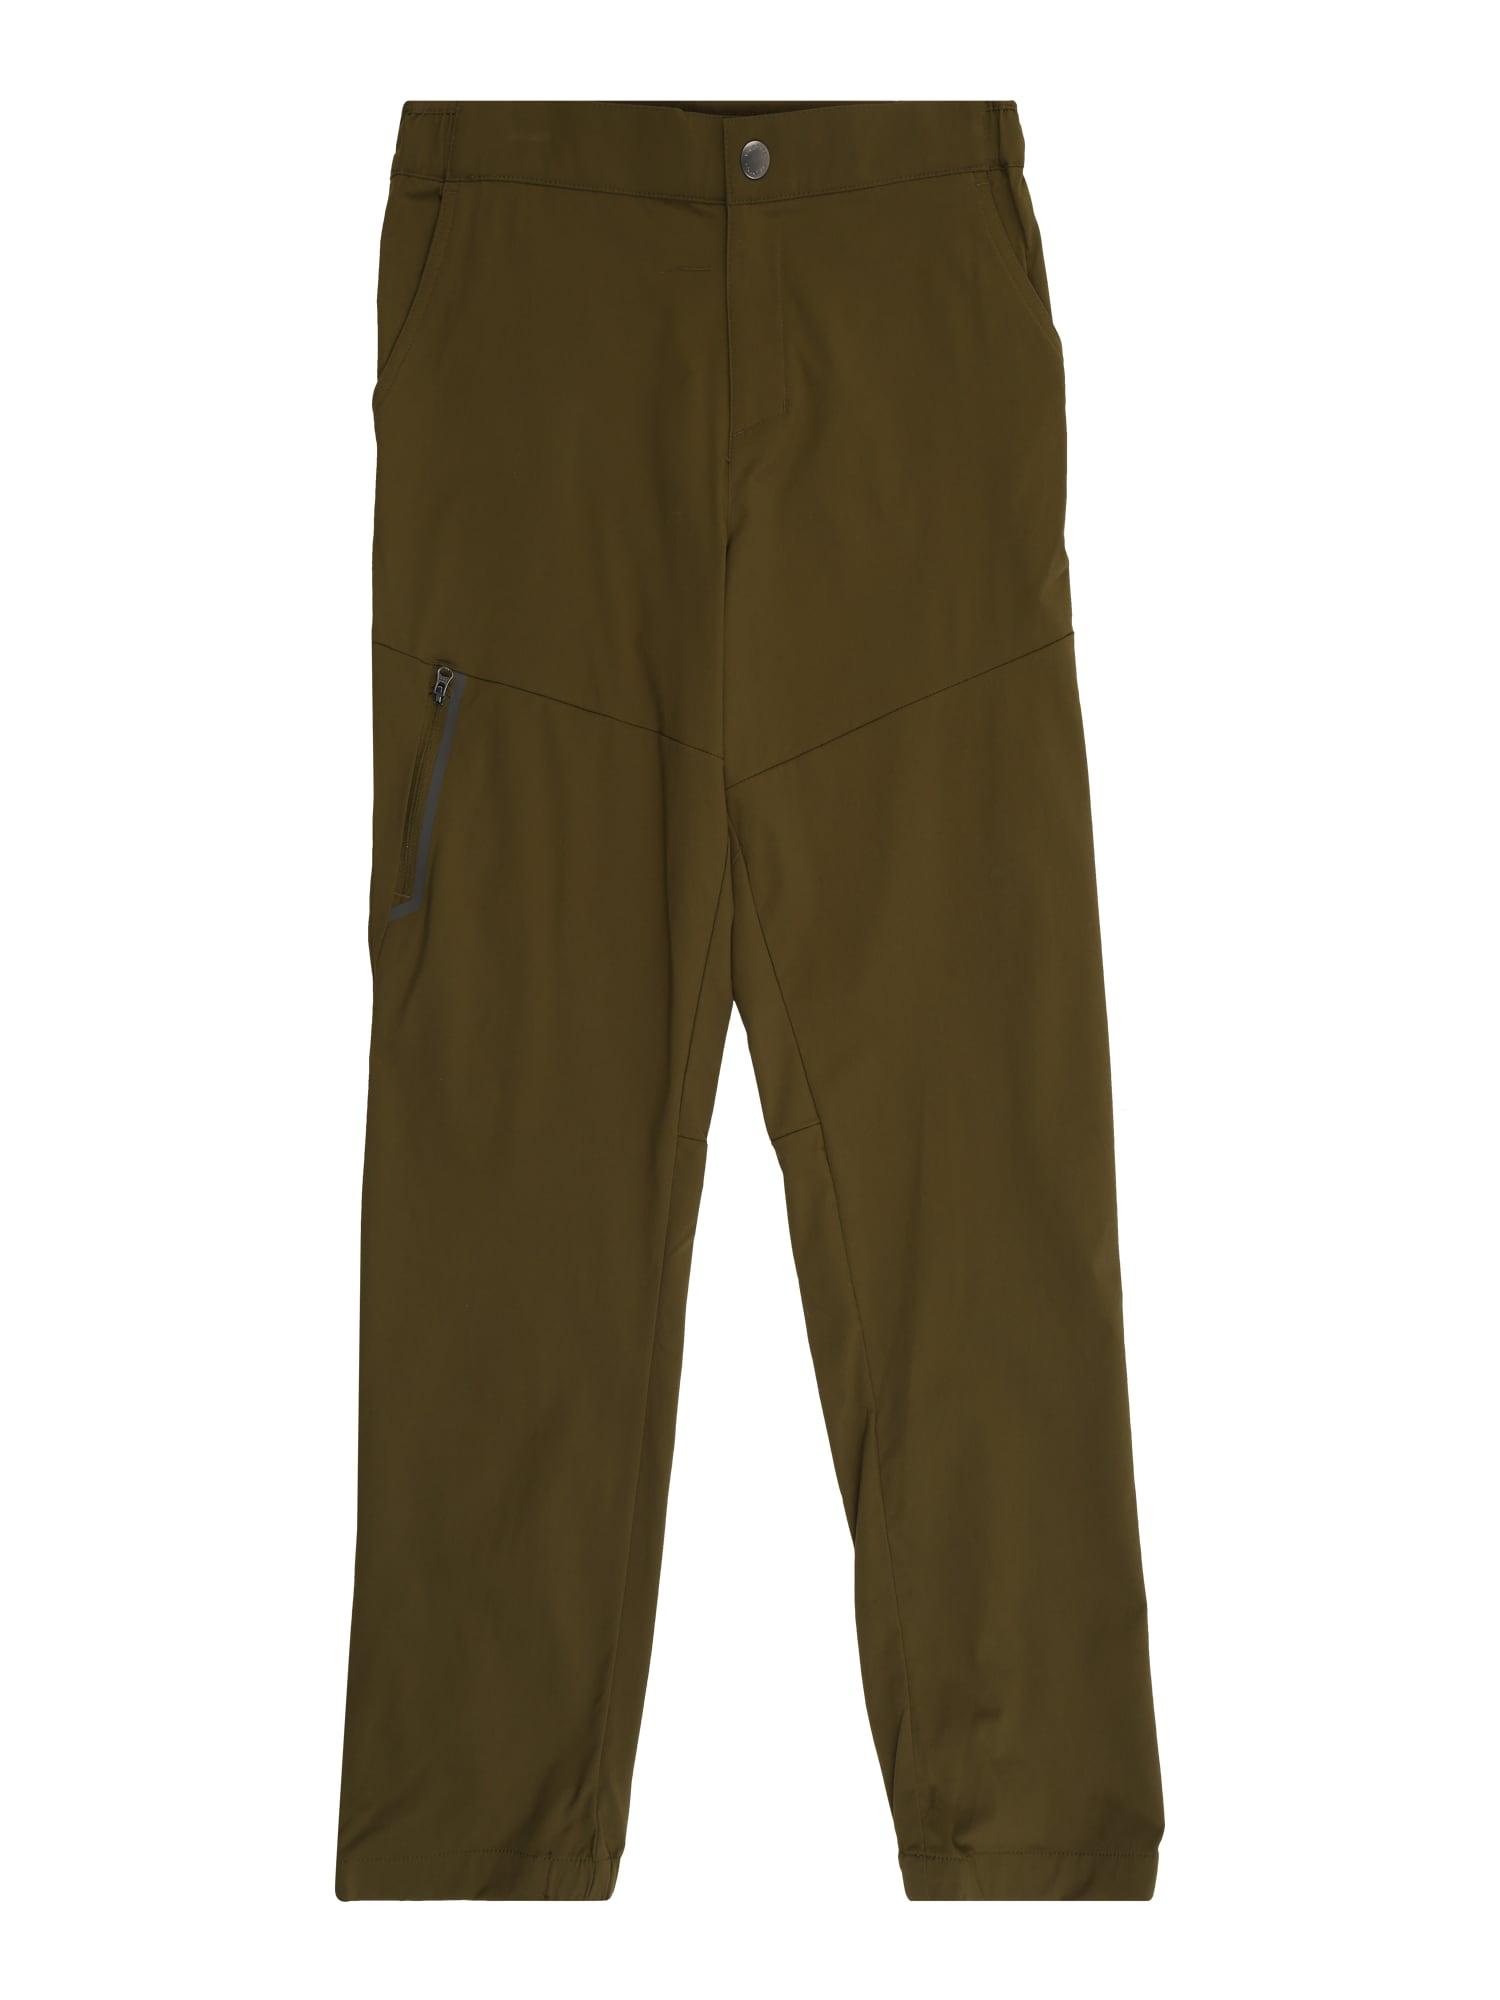 COLUMBIA Outodoor kalhoty 'Tech Trek™ '  olivová